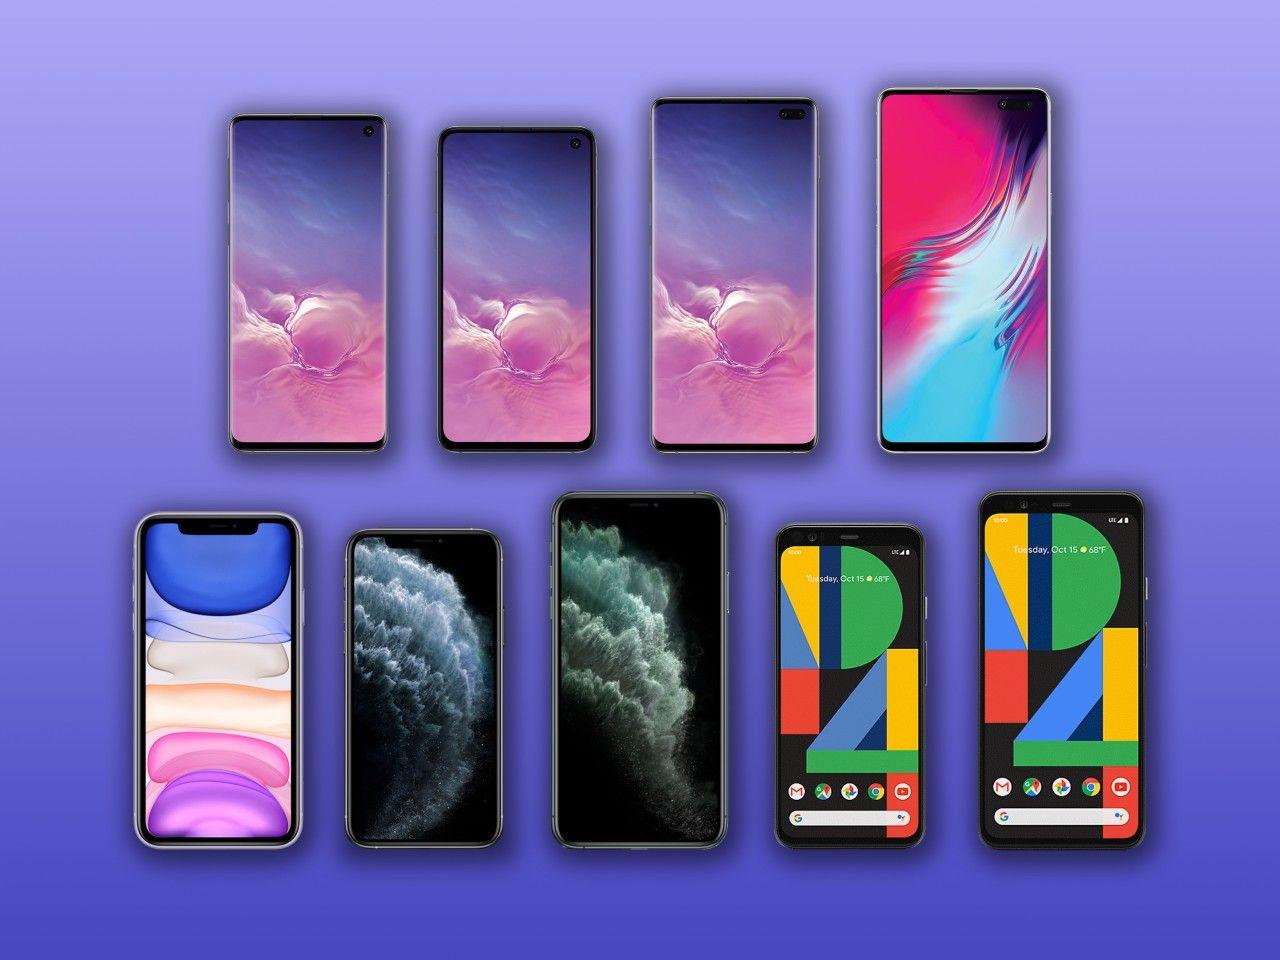 2019 flagship phone comparison iPhone 11 vs. Pixel 4 vs